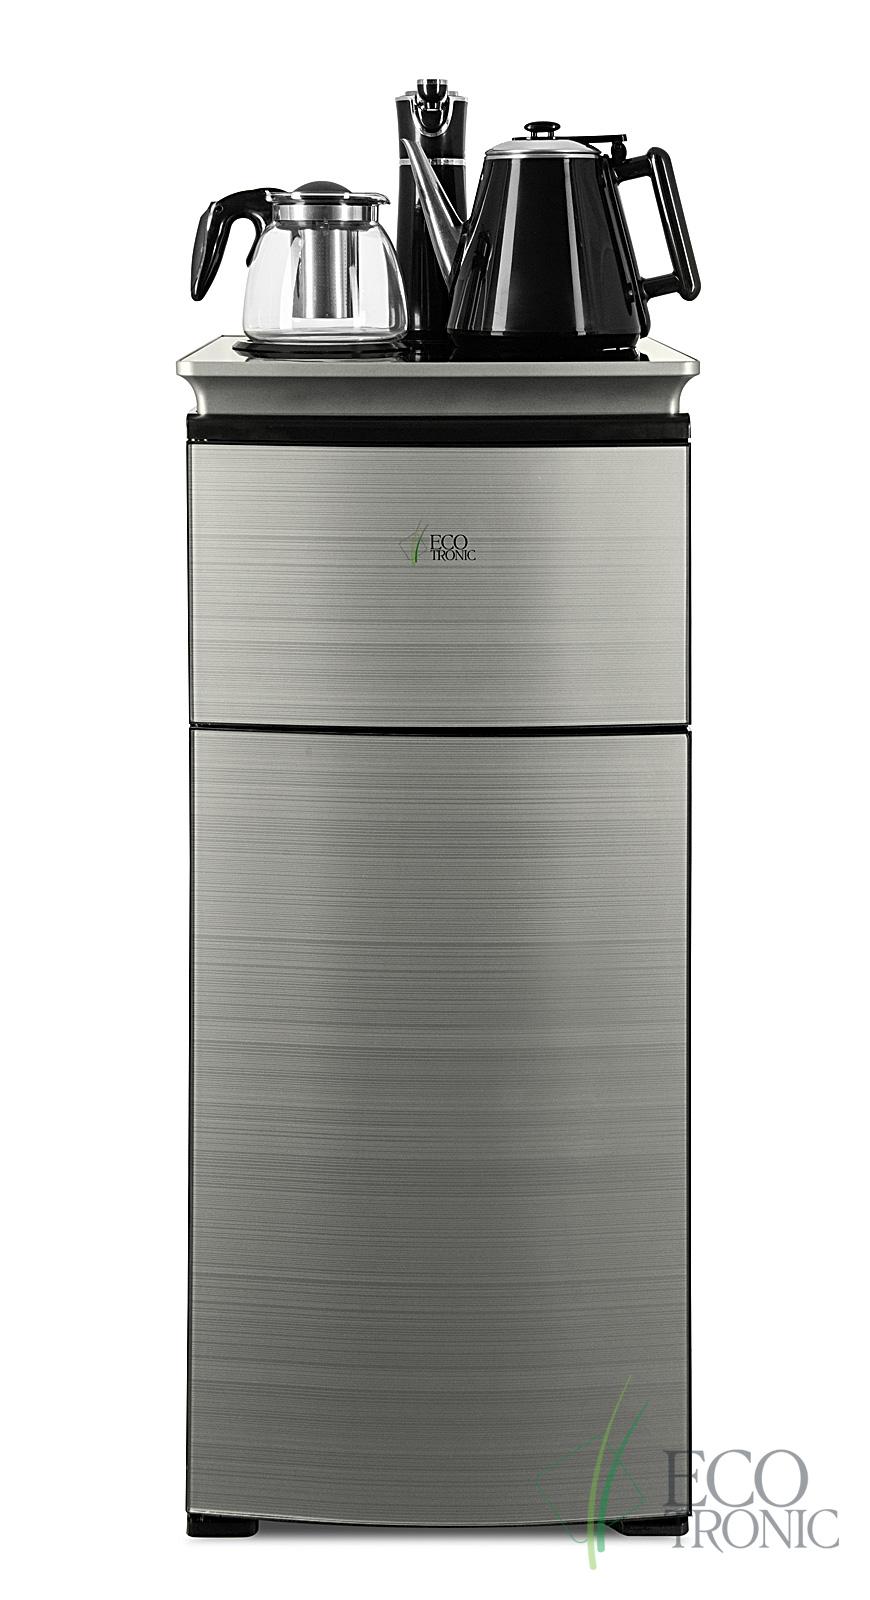 Кулер с чайным столиком Тиабар Ecotronic TB9-LN silver